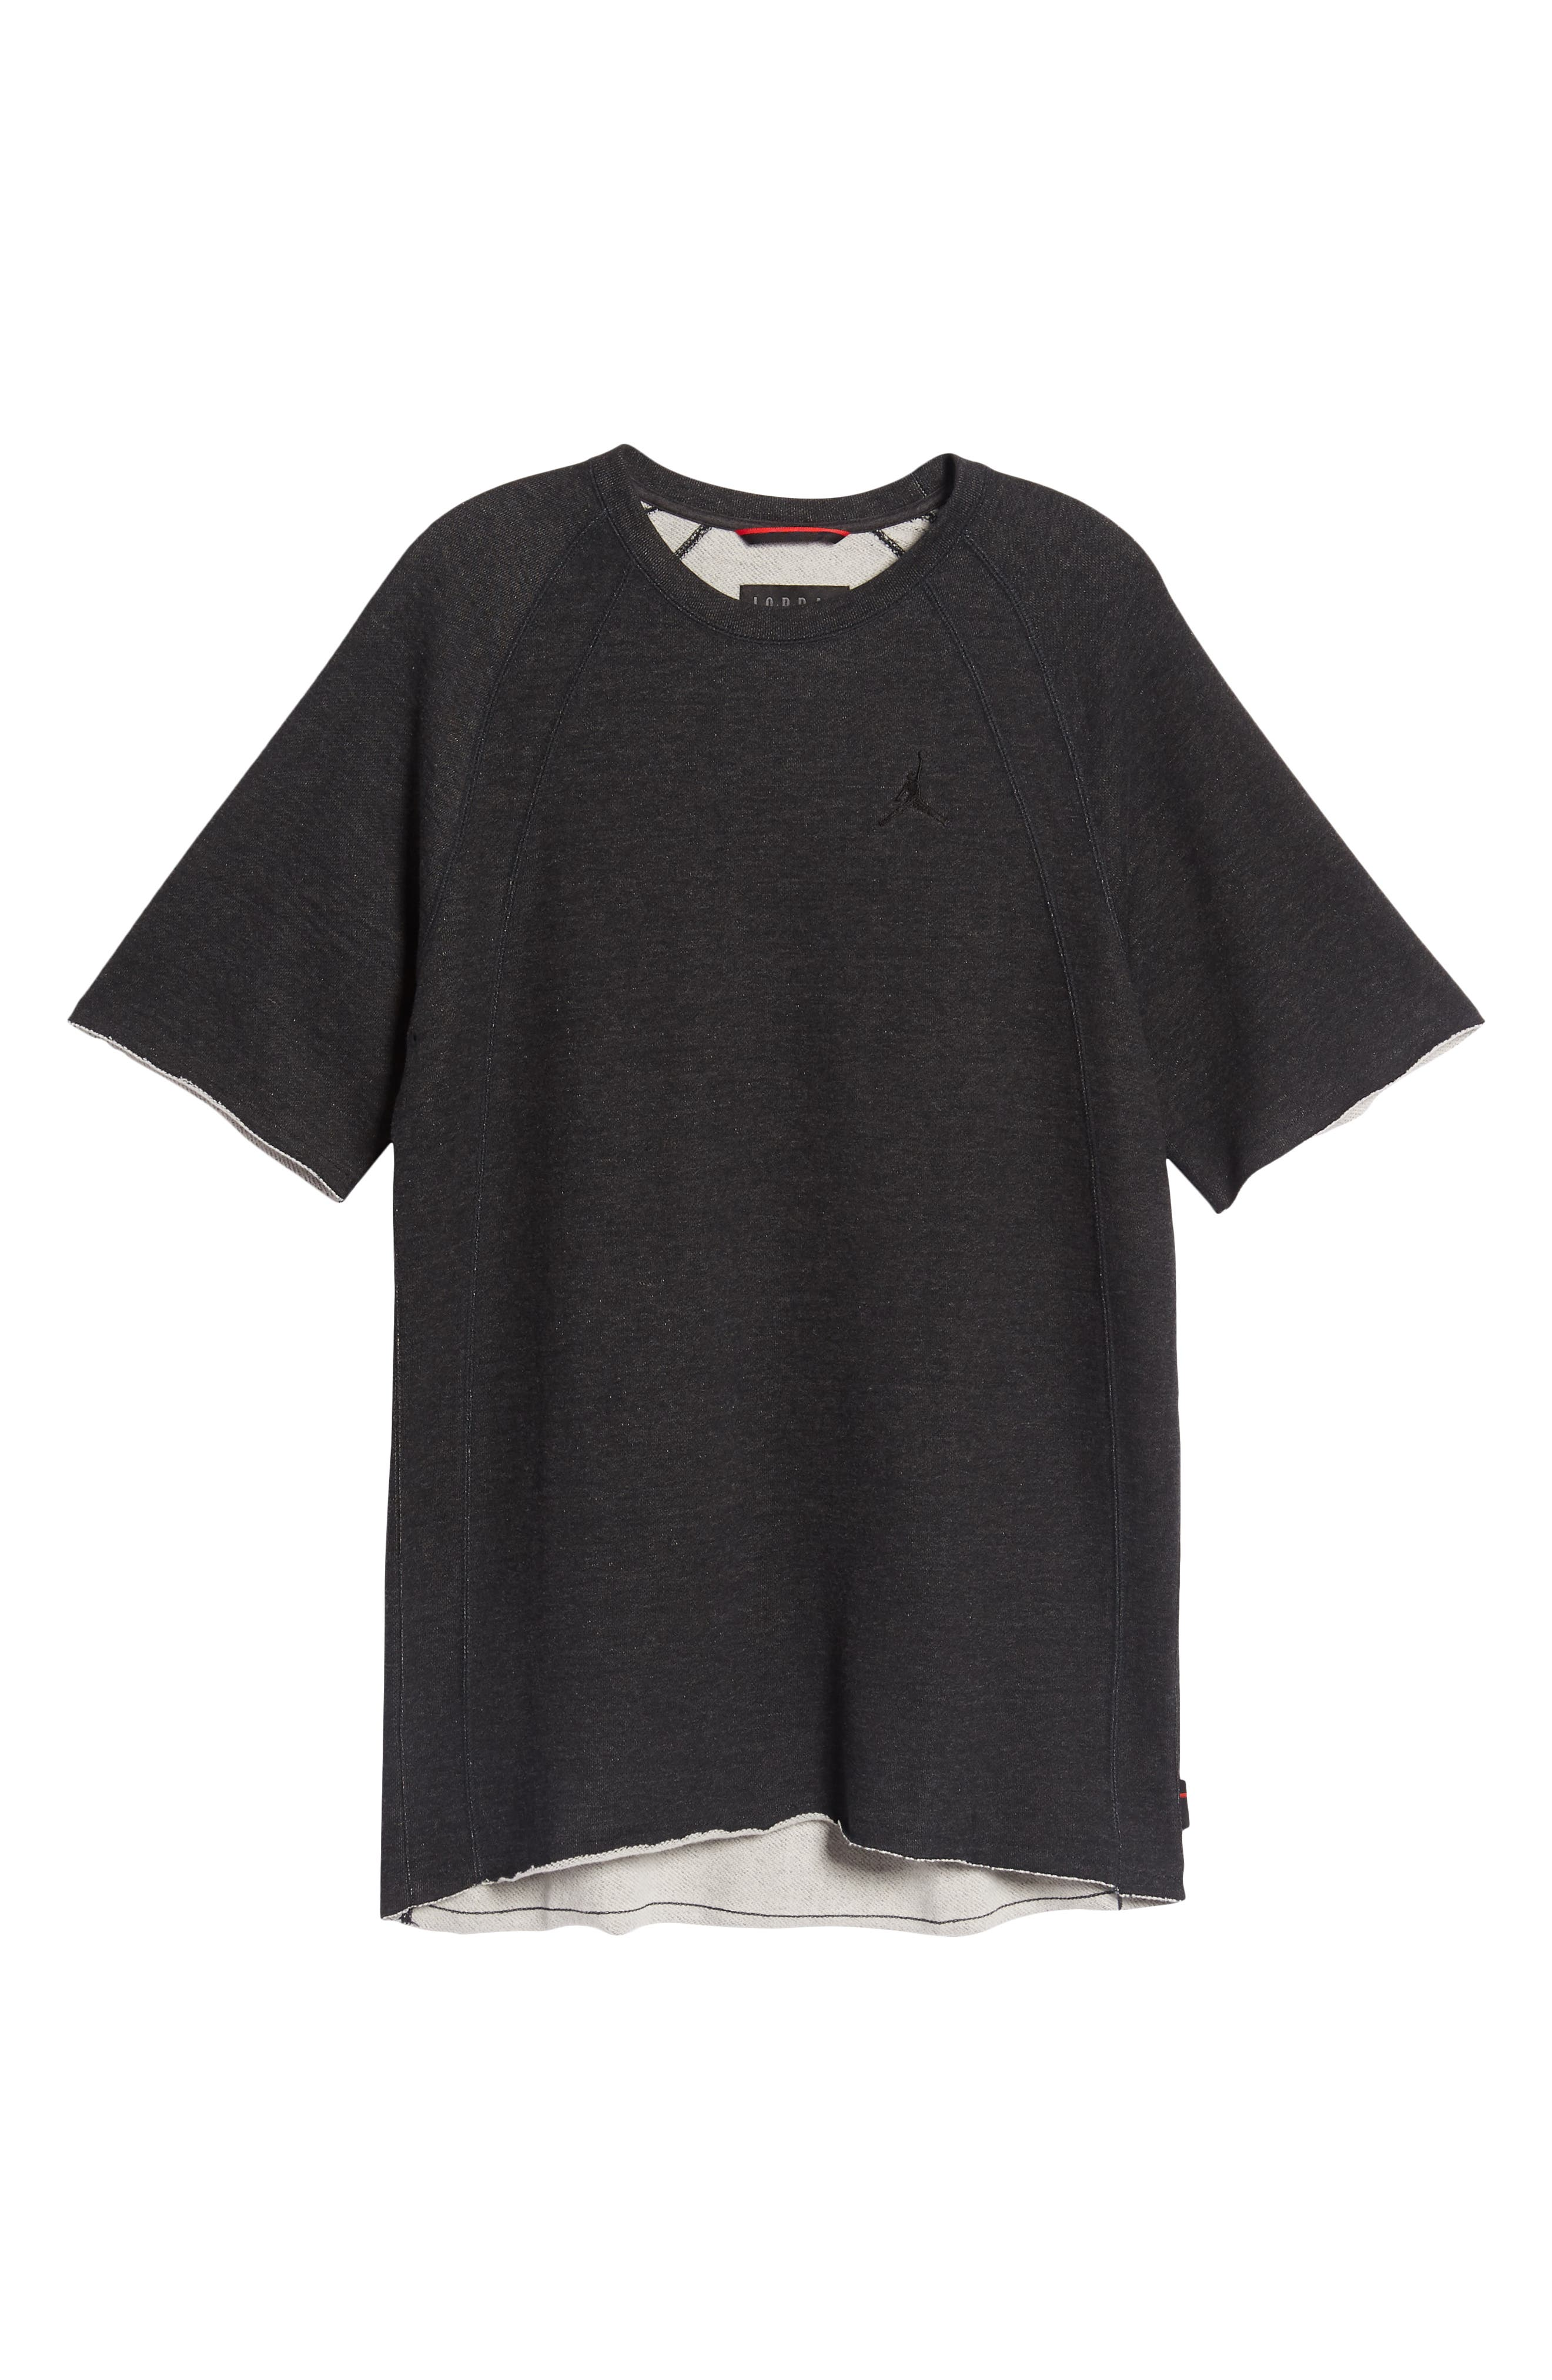 Wings Light Short Sleeve Sweatshirt,                             Alternate thumbnail 6, color,                             BLACK HEATHER/ BLACK